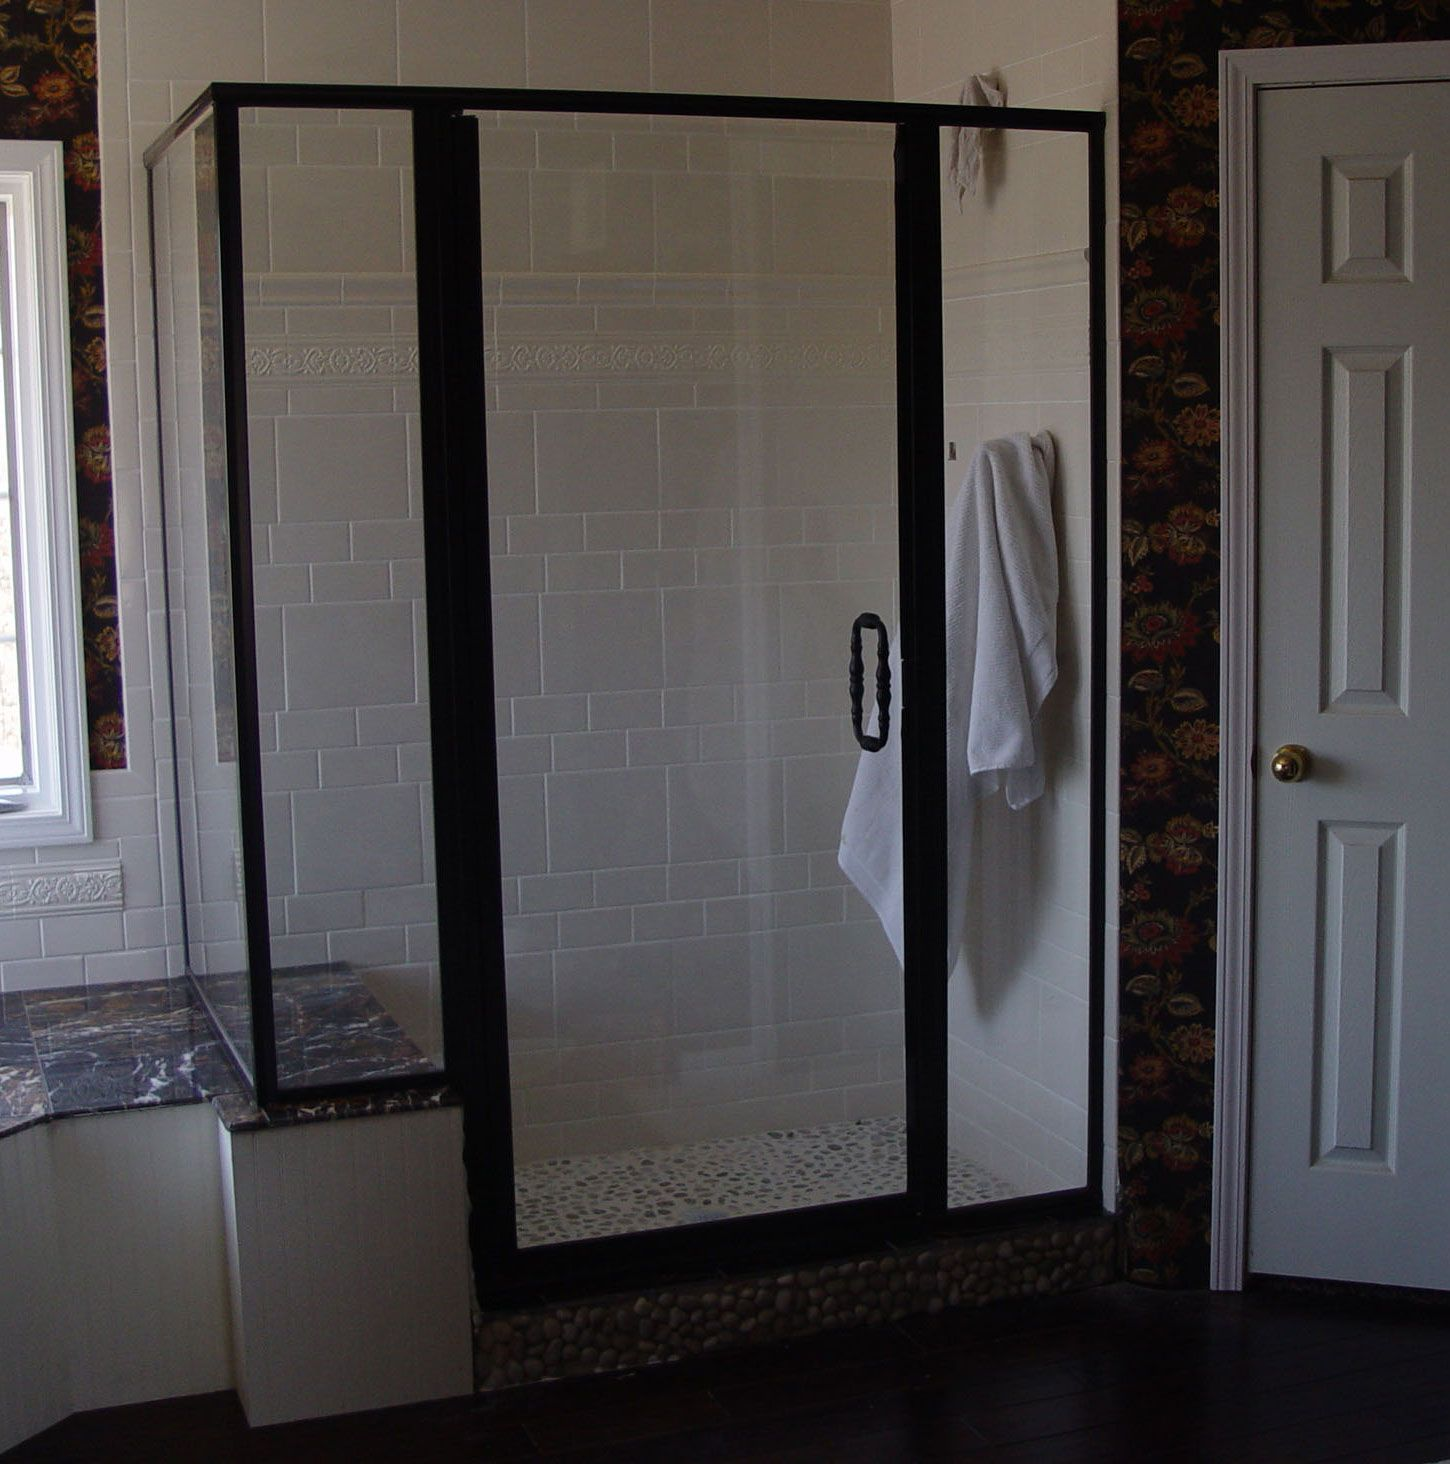 Shower Doors | Sliding shower doors from Cardinal Shower Enclosures.